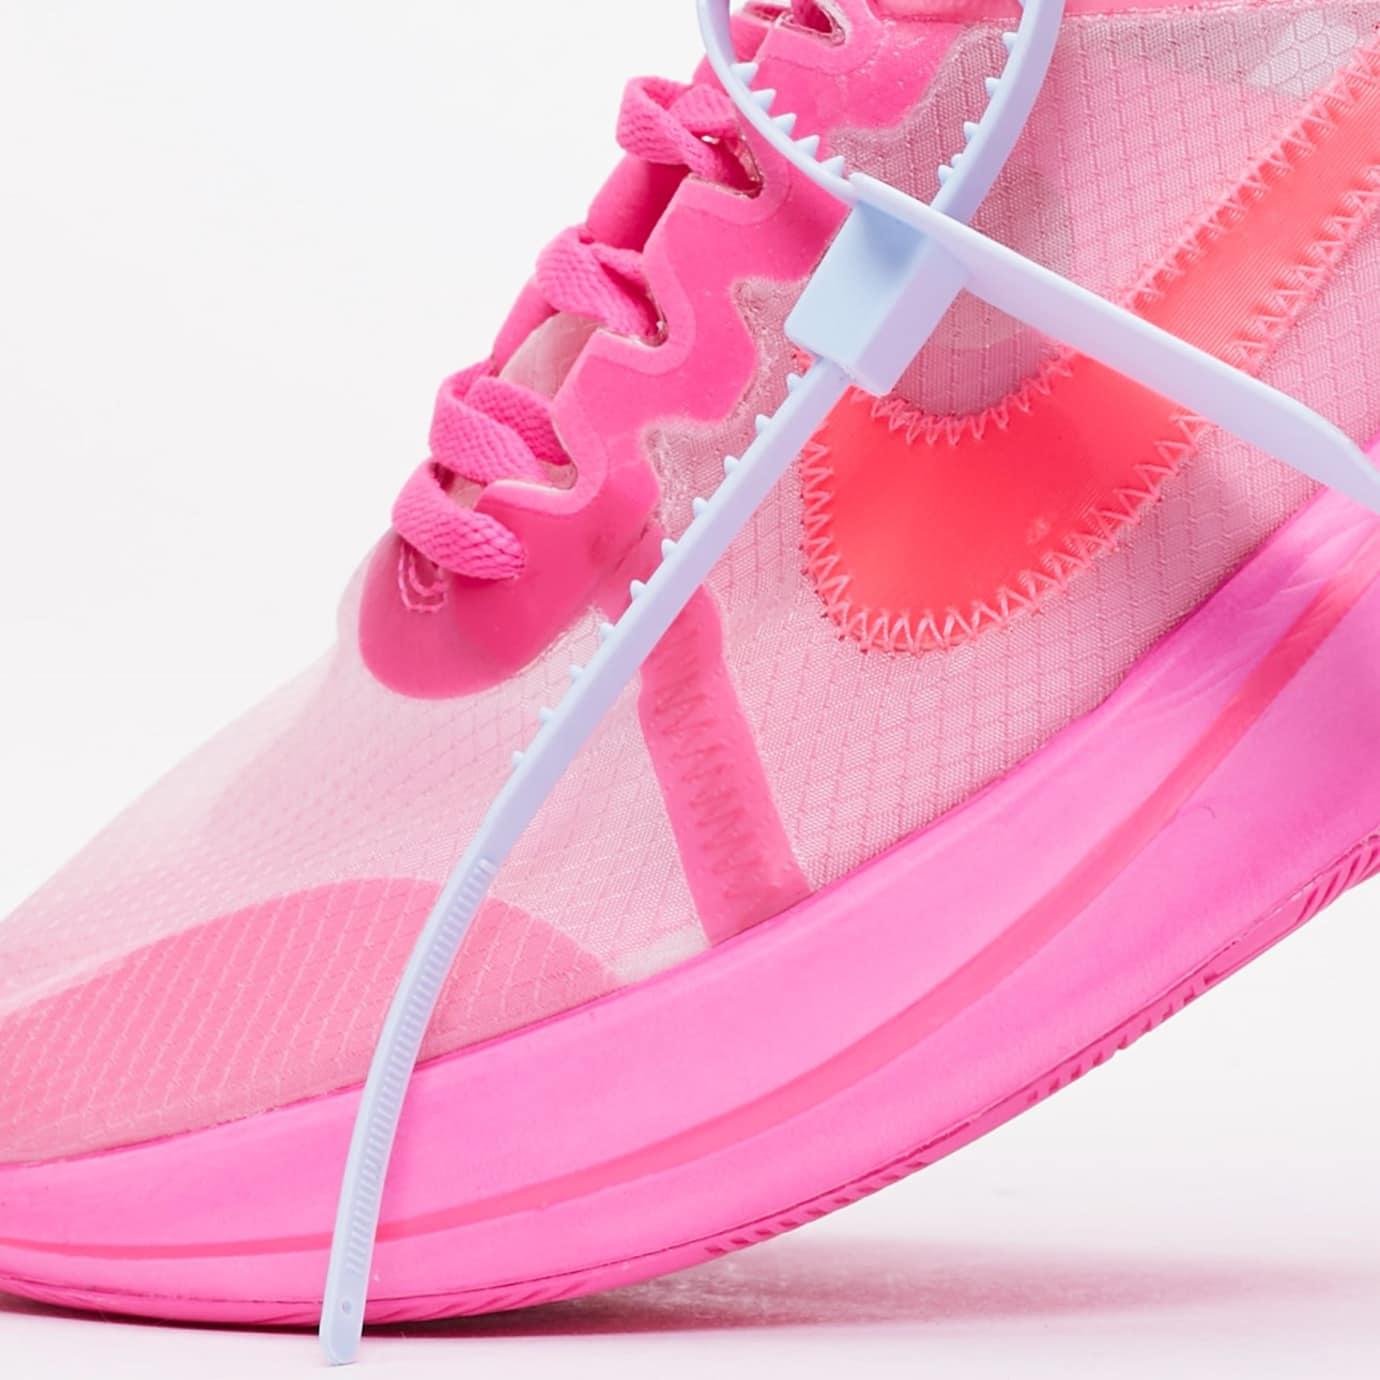 7207a70abfd0 Off-White X Nike Zoom Fly - Proper Magazine